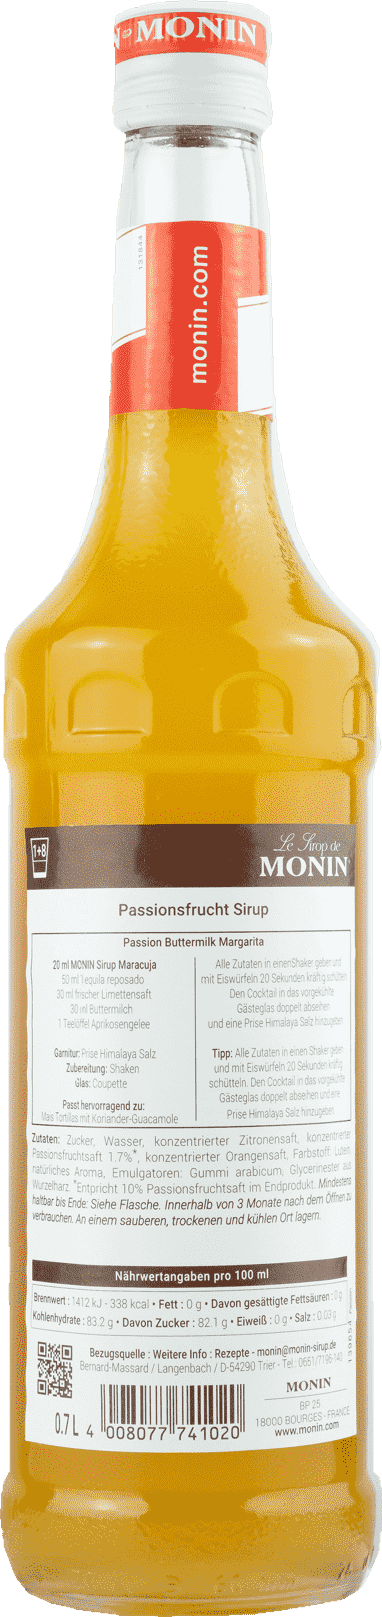 Monin Sirup Maracuja 0,7l Passionsfrucht